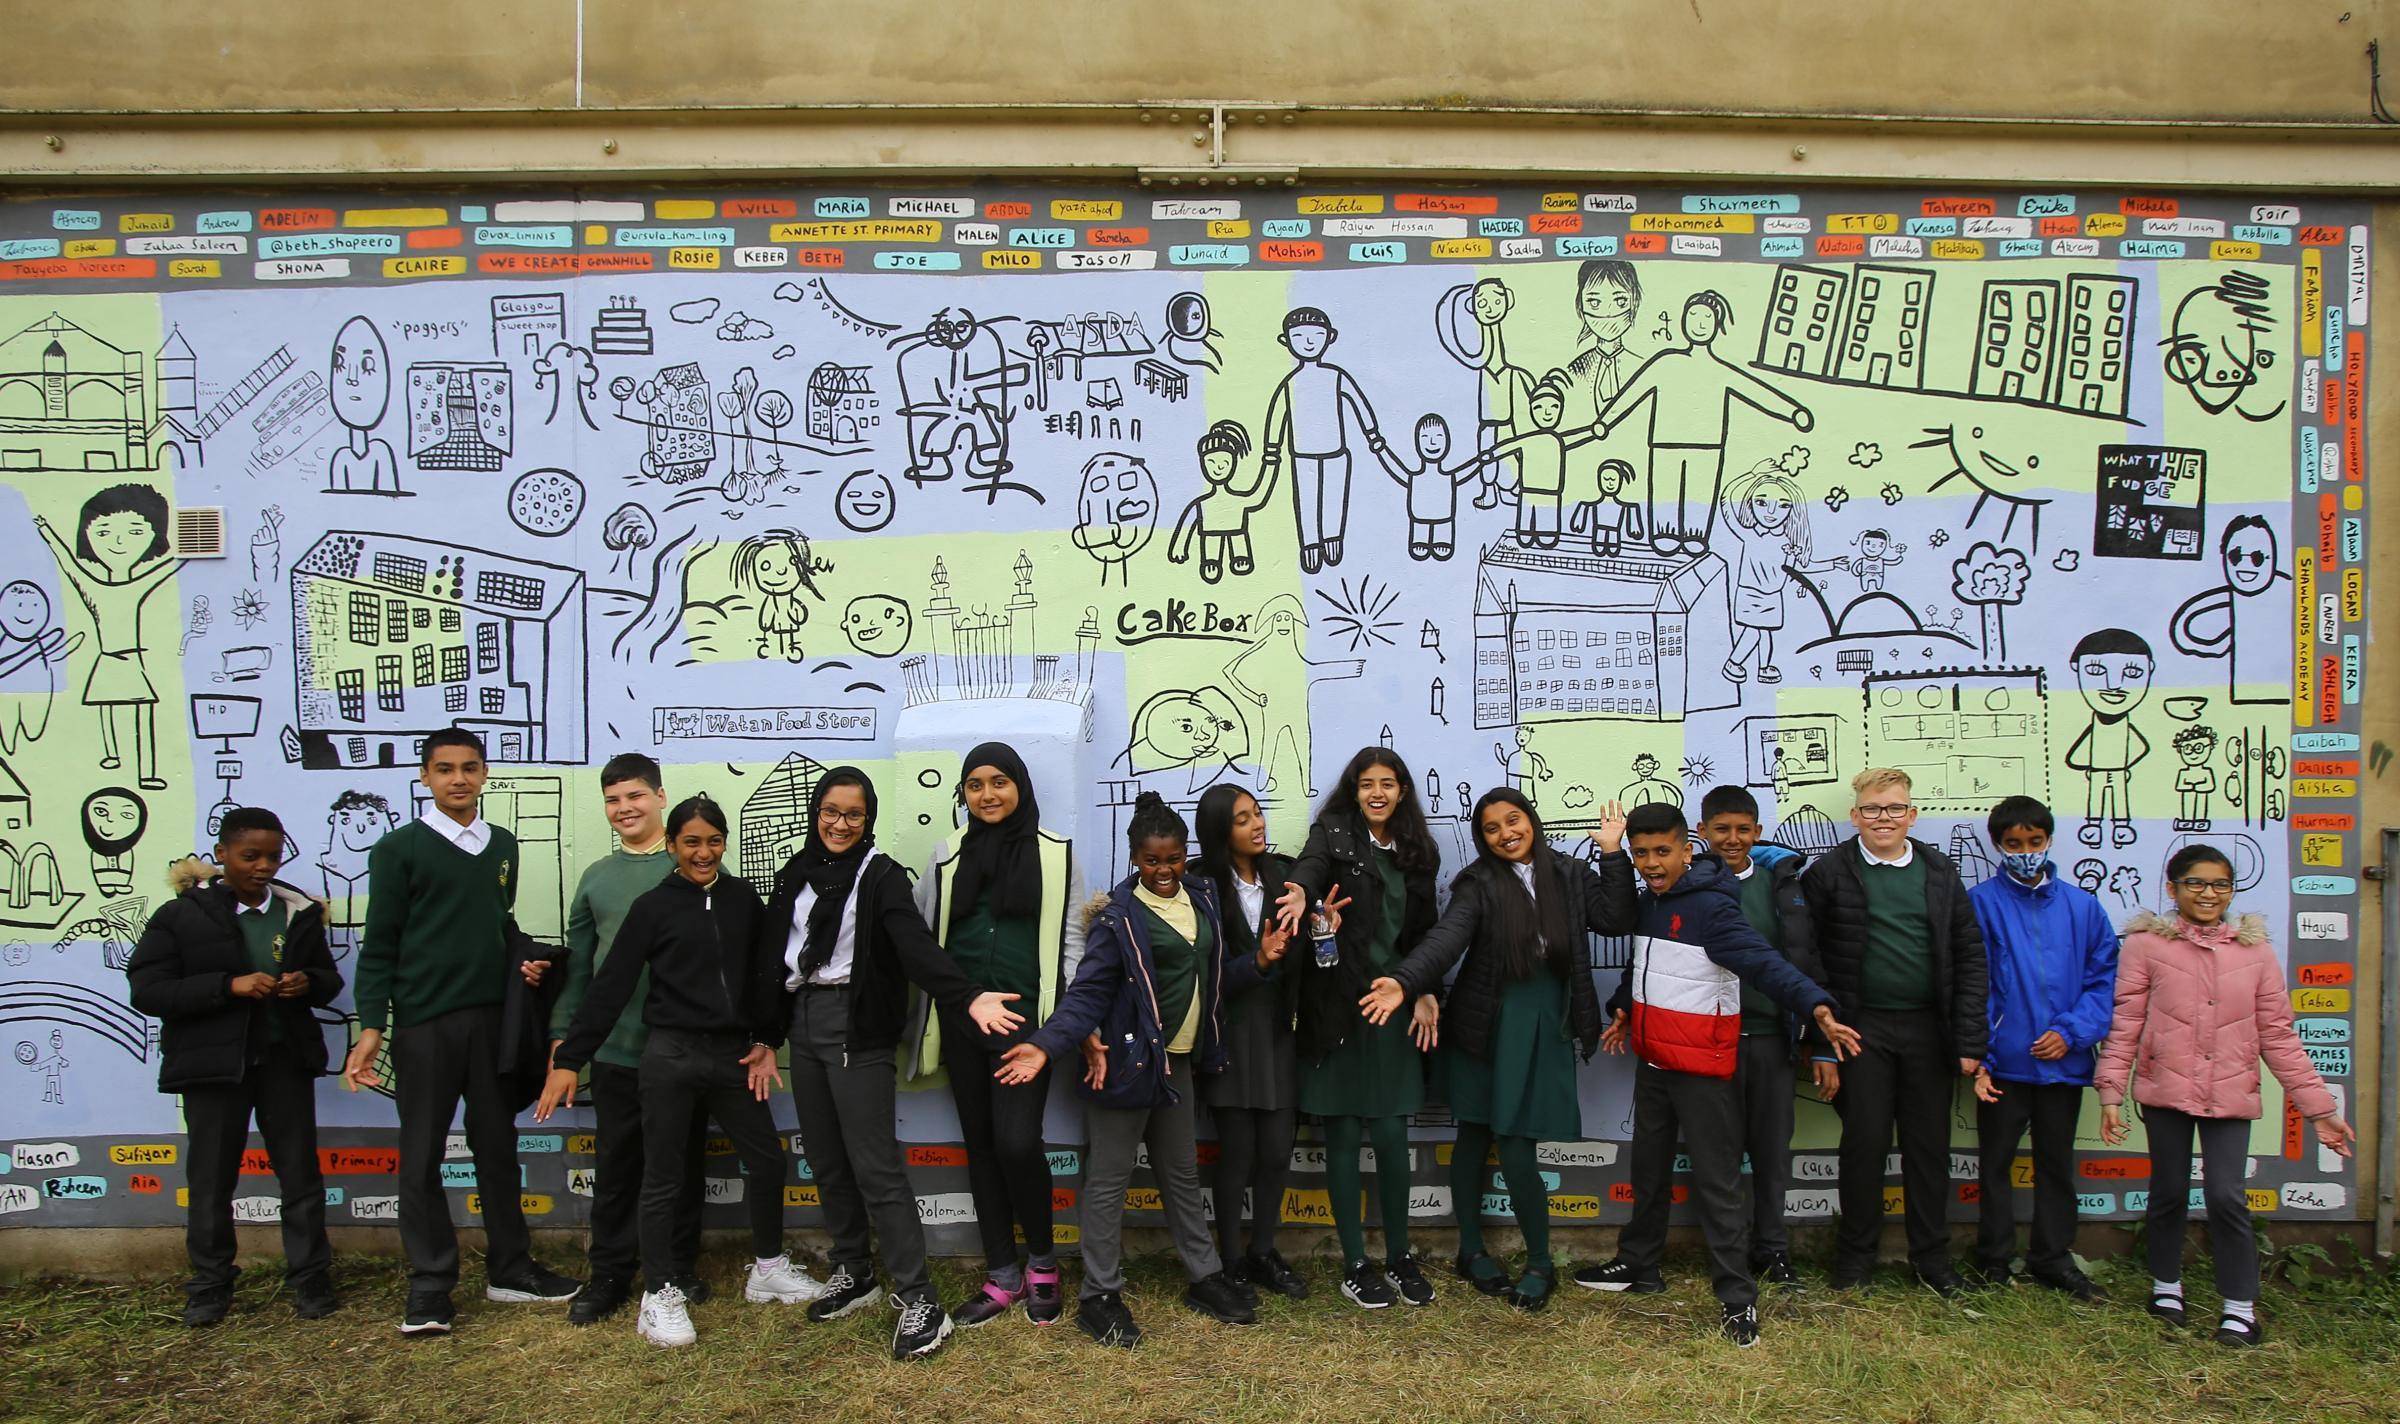 Glasgow mural is celebration of Govanhill's diversity